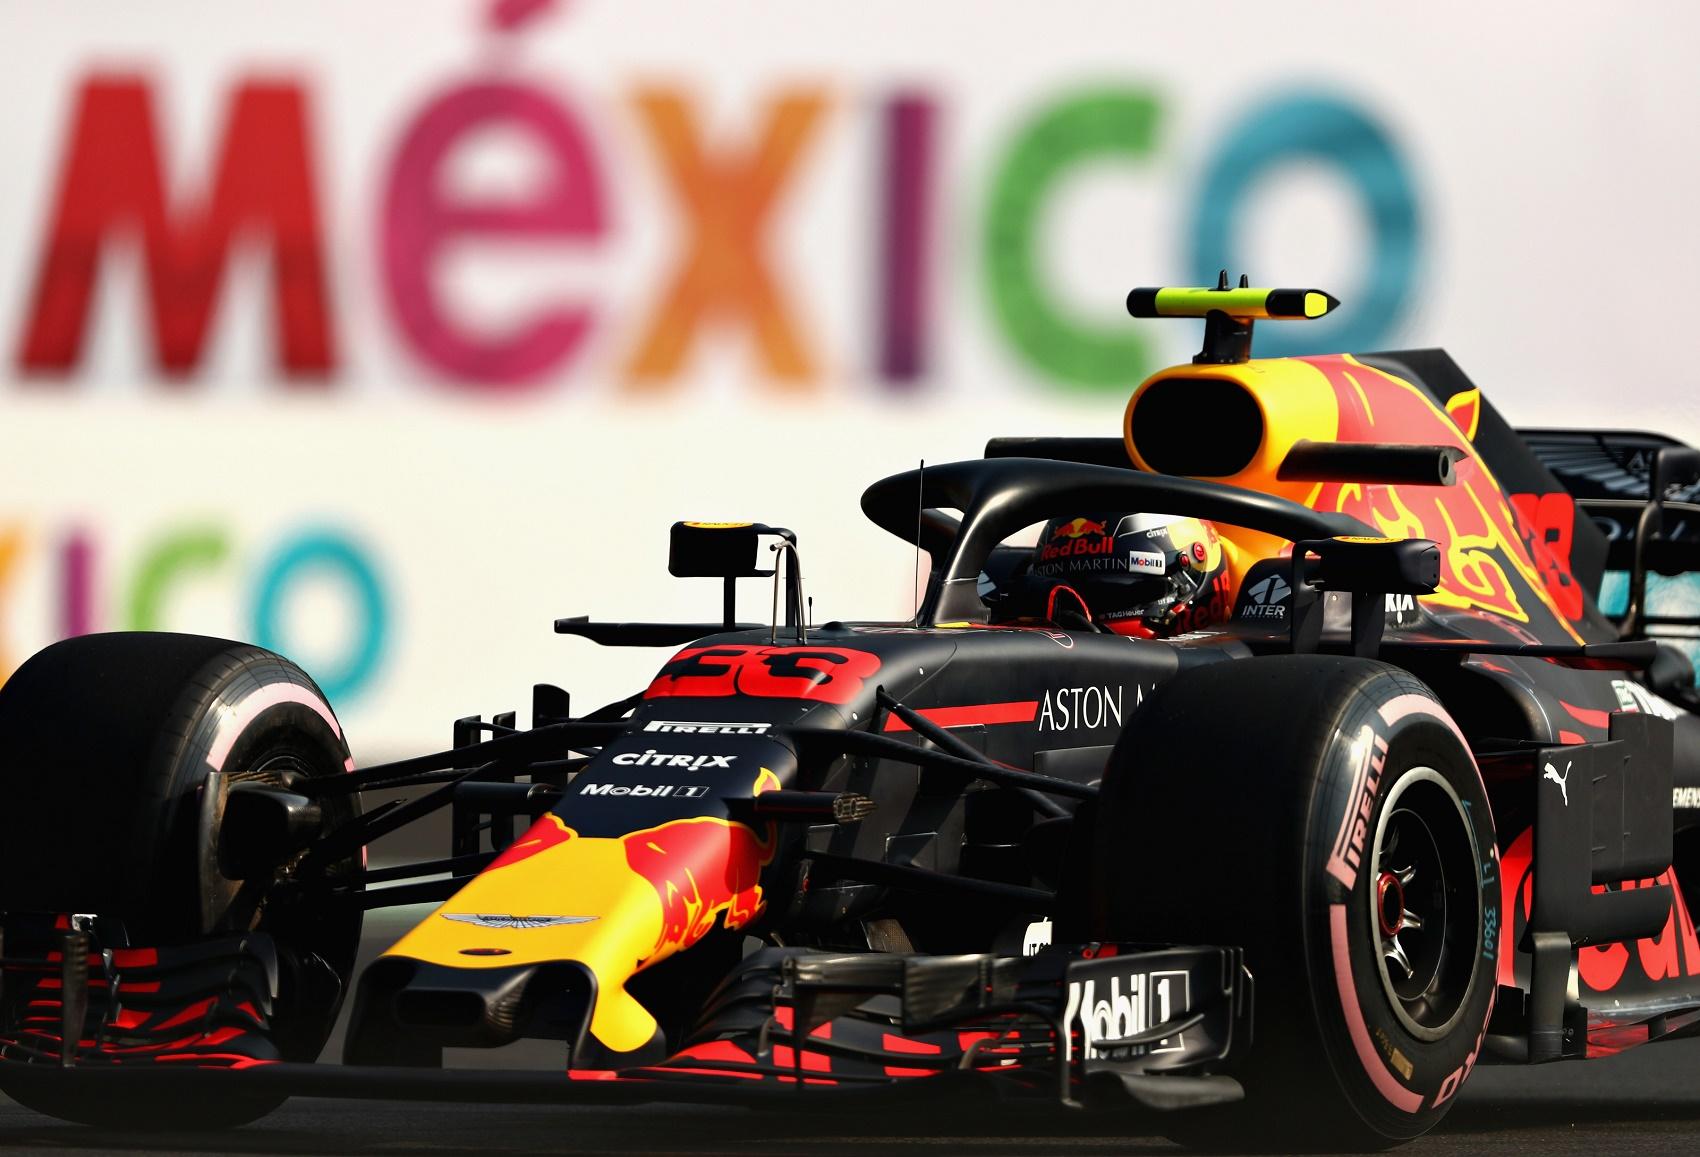 Max Verstappen Red Bull Mexico, racingline, racinglinehu, racingline.hu